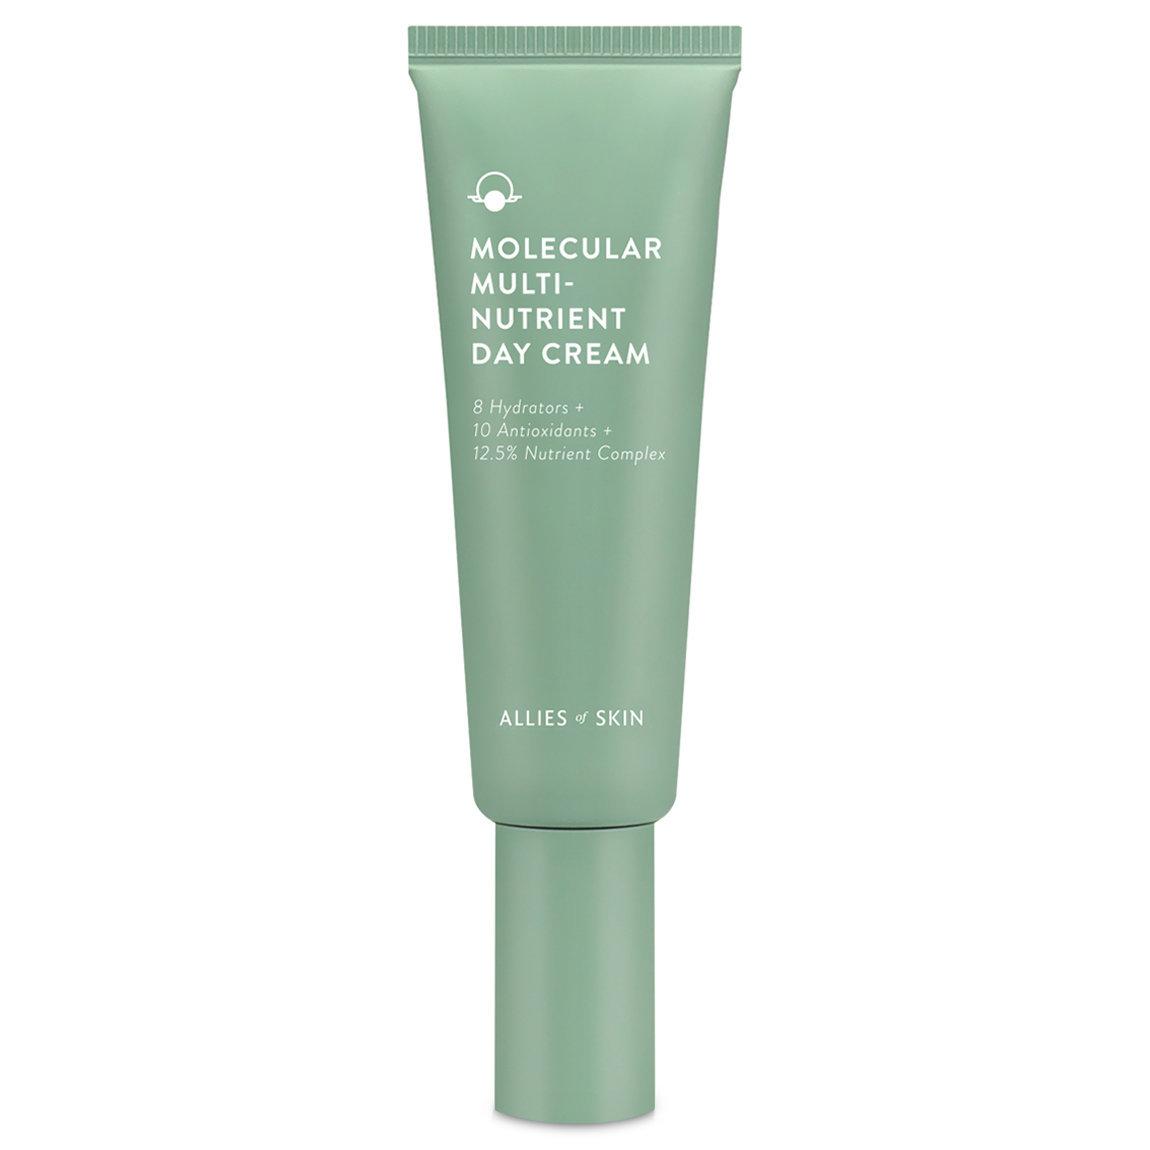 Allies of Skin Molecular Multi-Nutrient Day Cream product swatch.